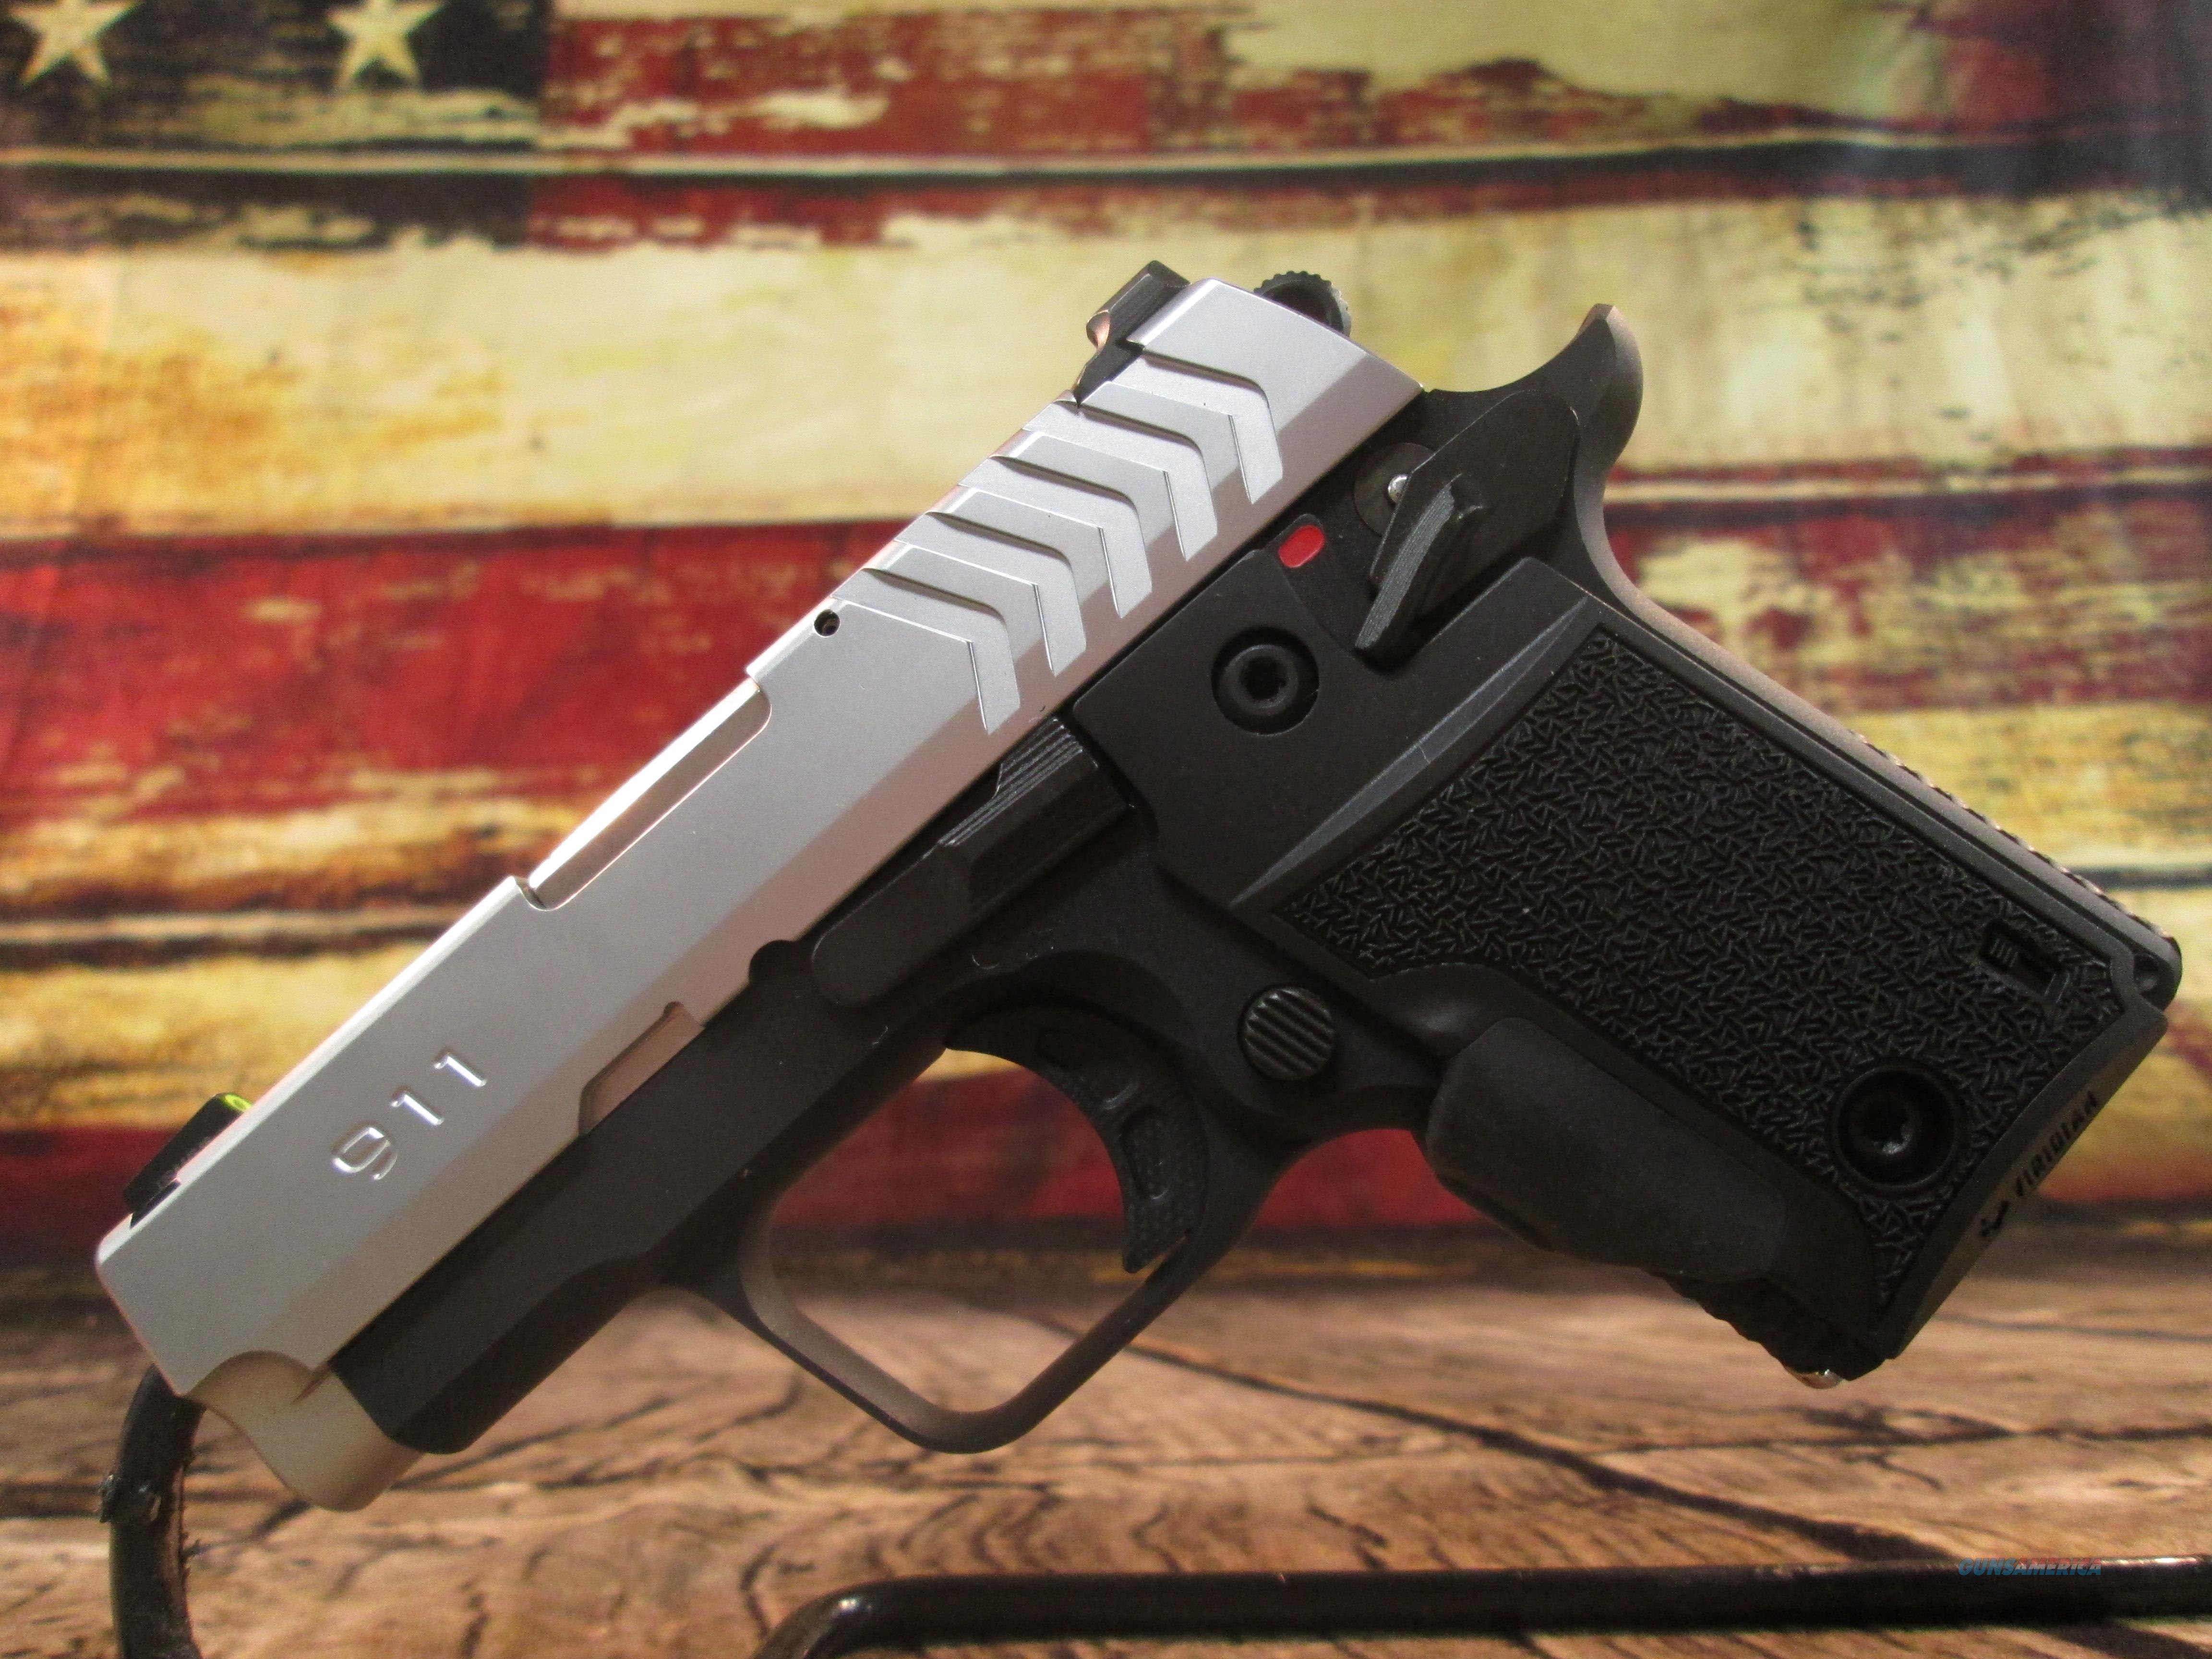 Springfield Armory 911 W/ Viridian Green Laser Grip .380 ACP New (PG9109SVG)  Guns > Pistols > Springfield Armory Pistols > 911